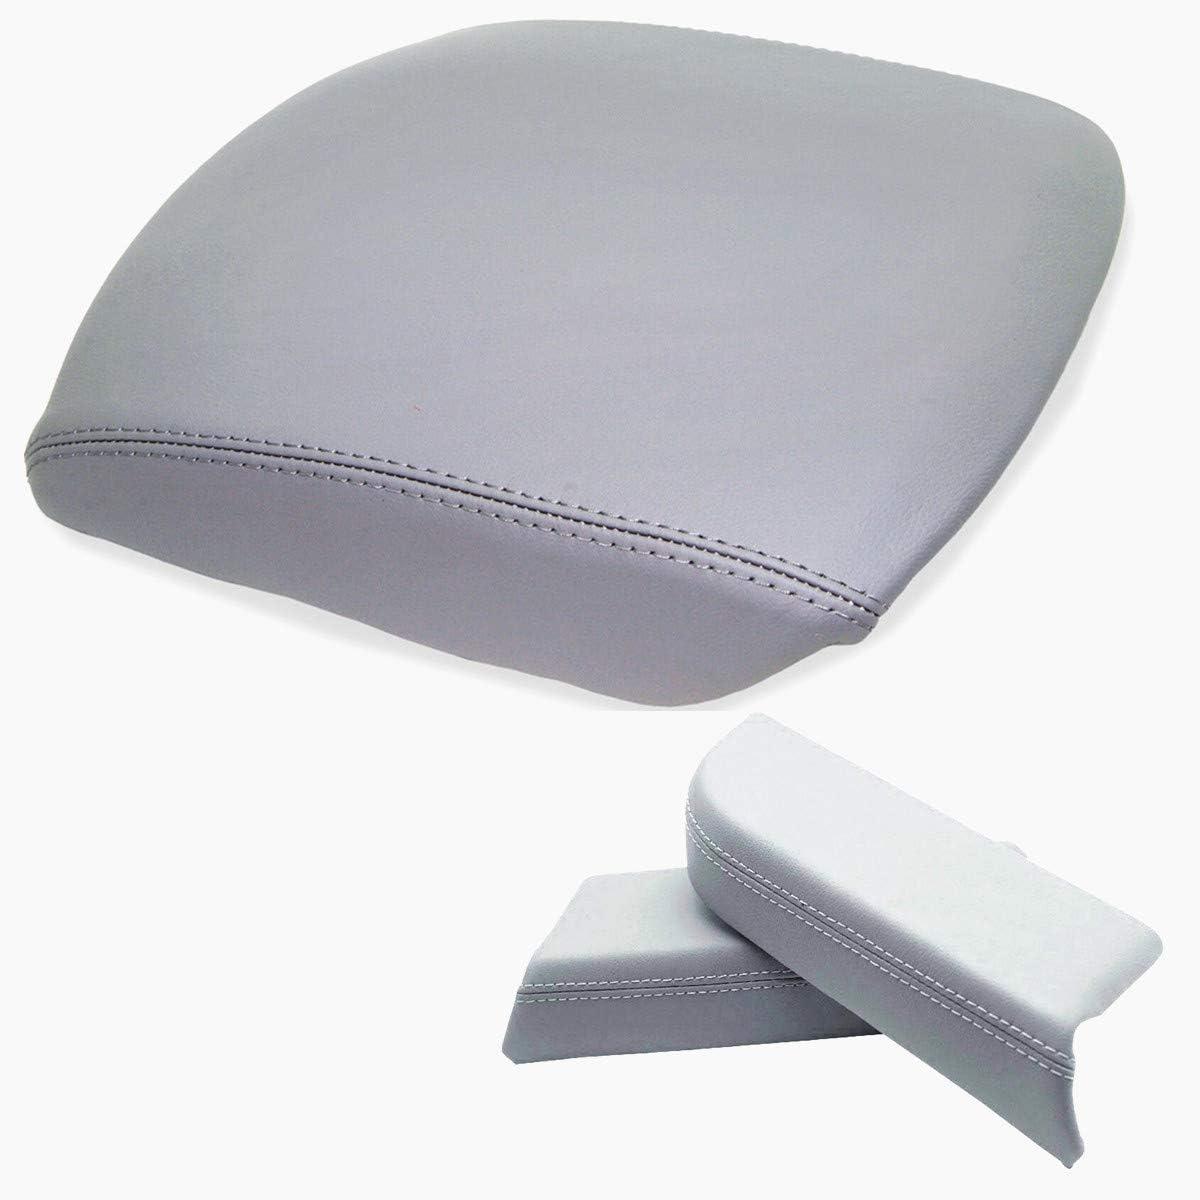 Dunhil Center Console Cover Front Door Armrest Replacement Kit Fits for 2009-2013 Honda Pilot Beige